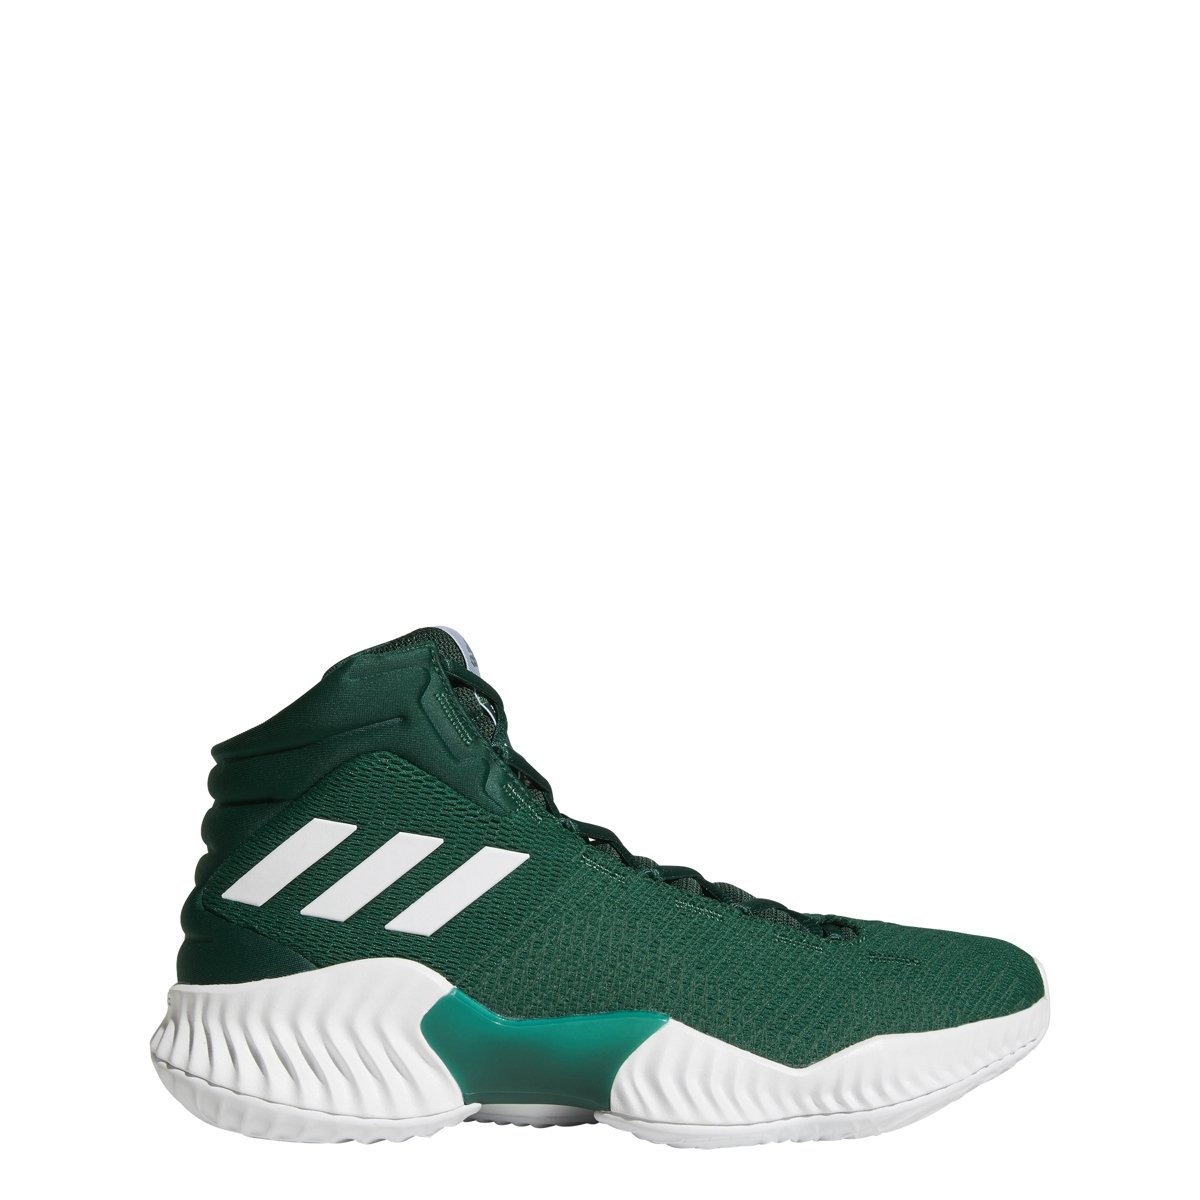 adidas Men's Pro Bounce 2018 Basketball Shoe B077X4R5S4 16 D(M) US|Dark Green/Dark Green/Dark Green